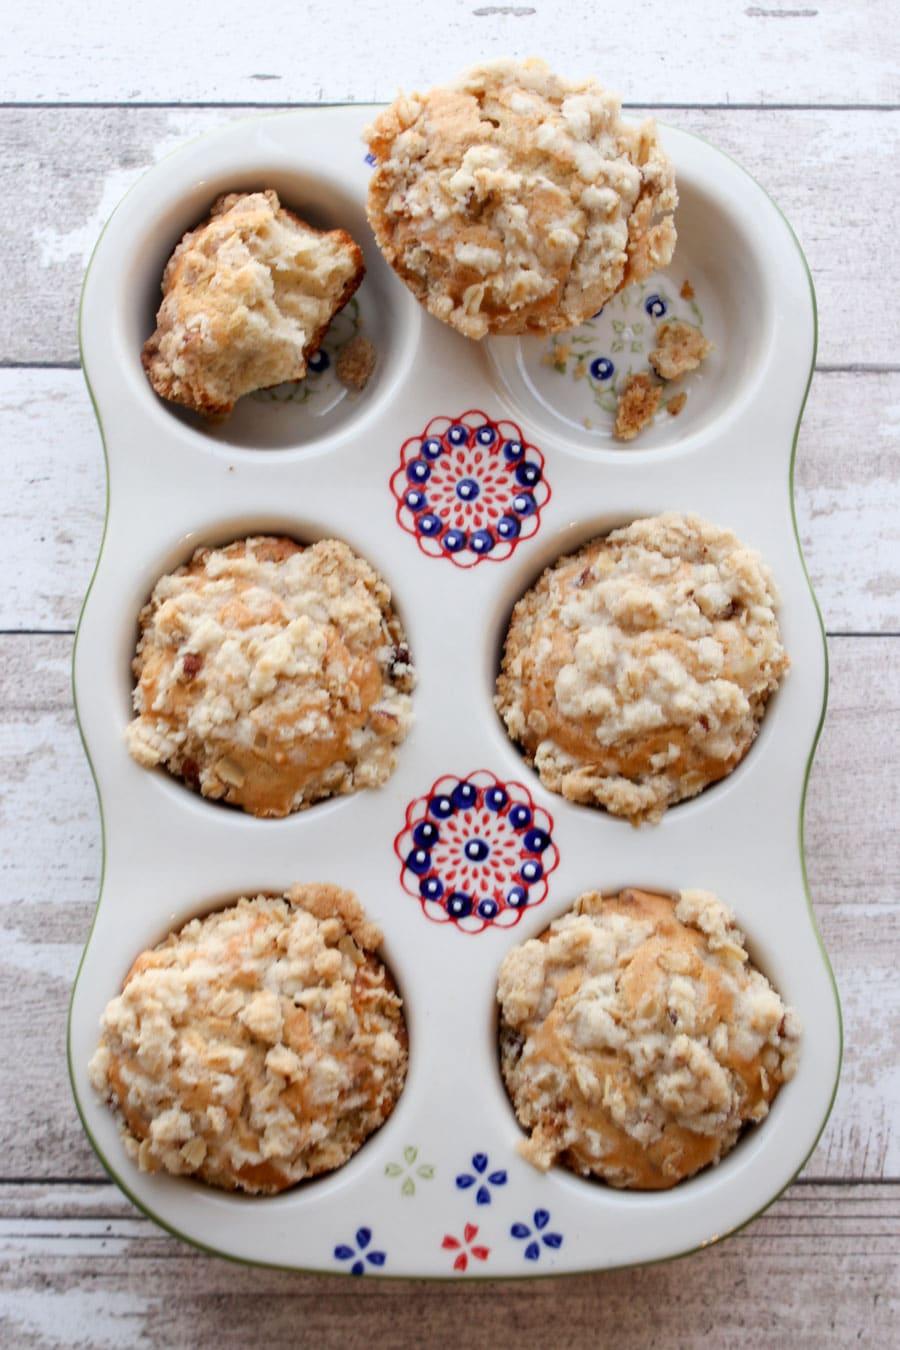 Coffee cake muffins in baking pan